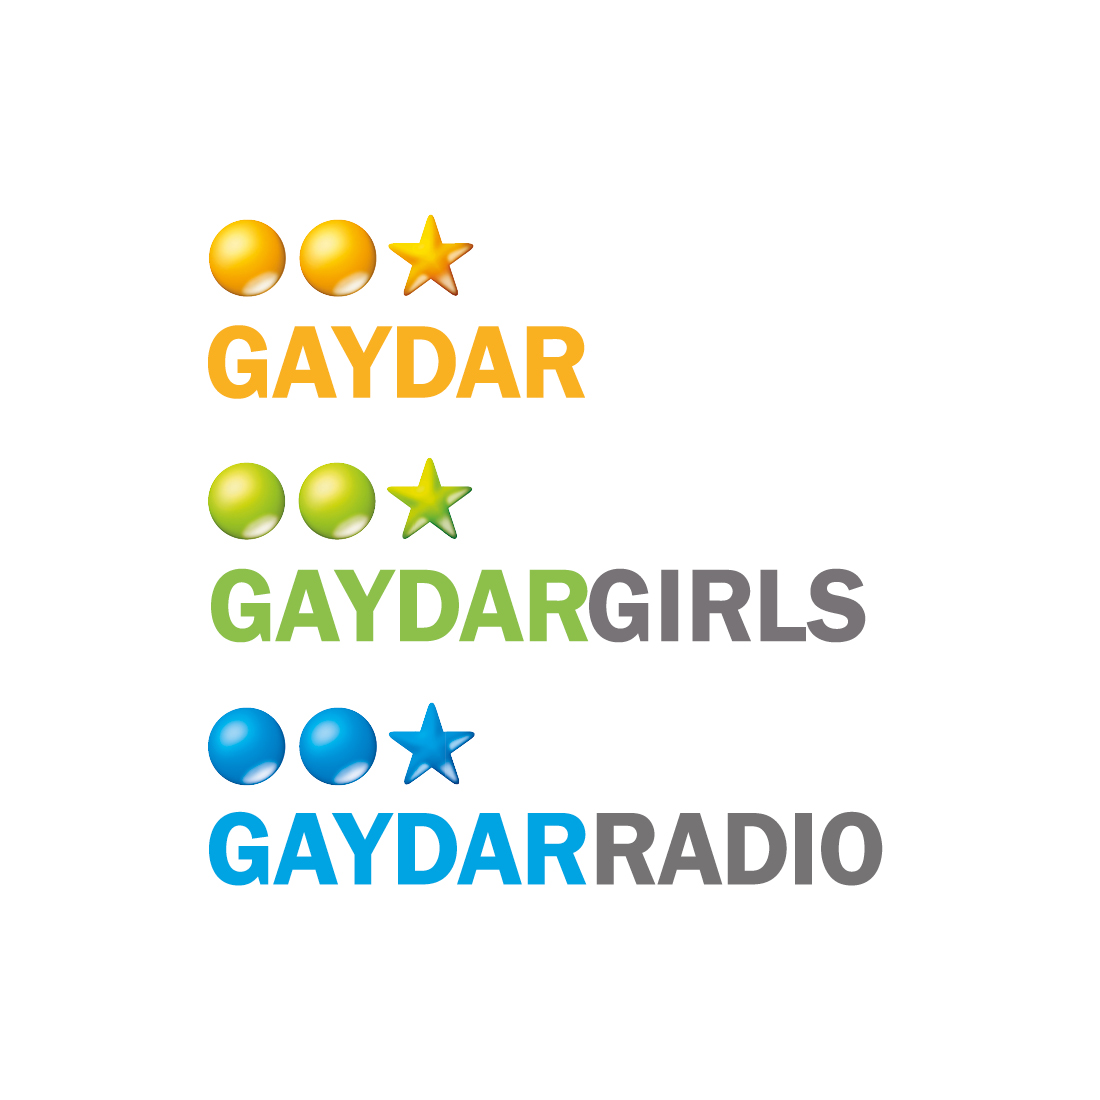 Gaydar Brand Logos